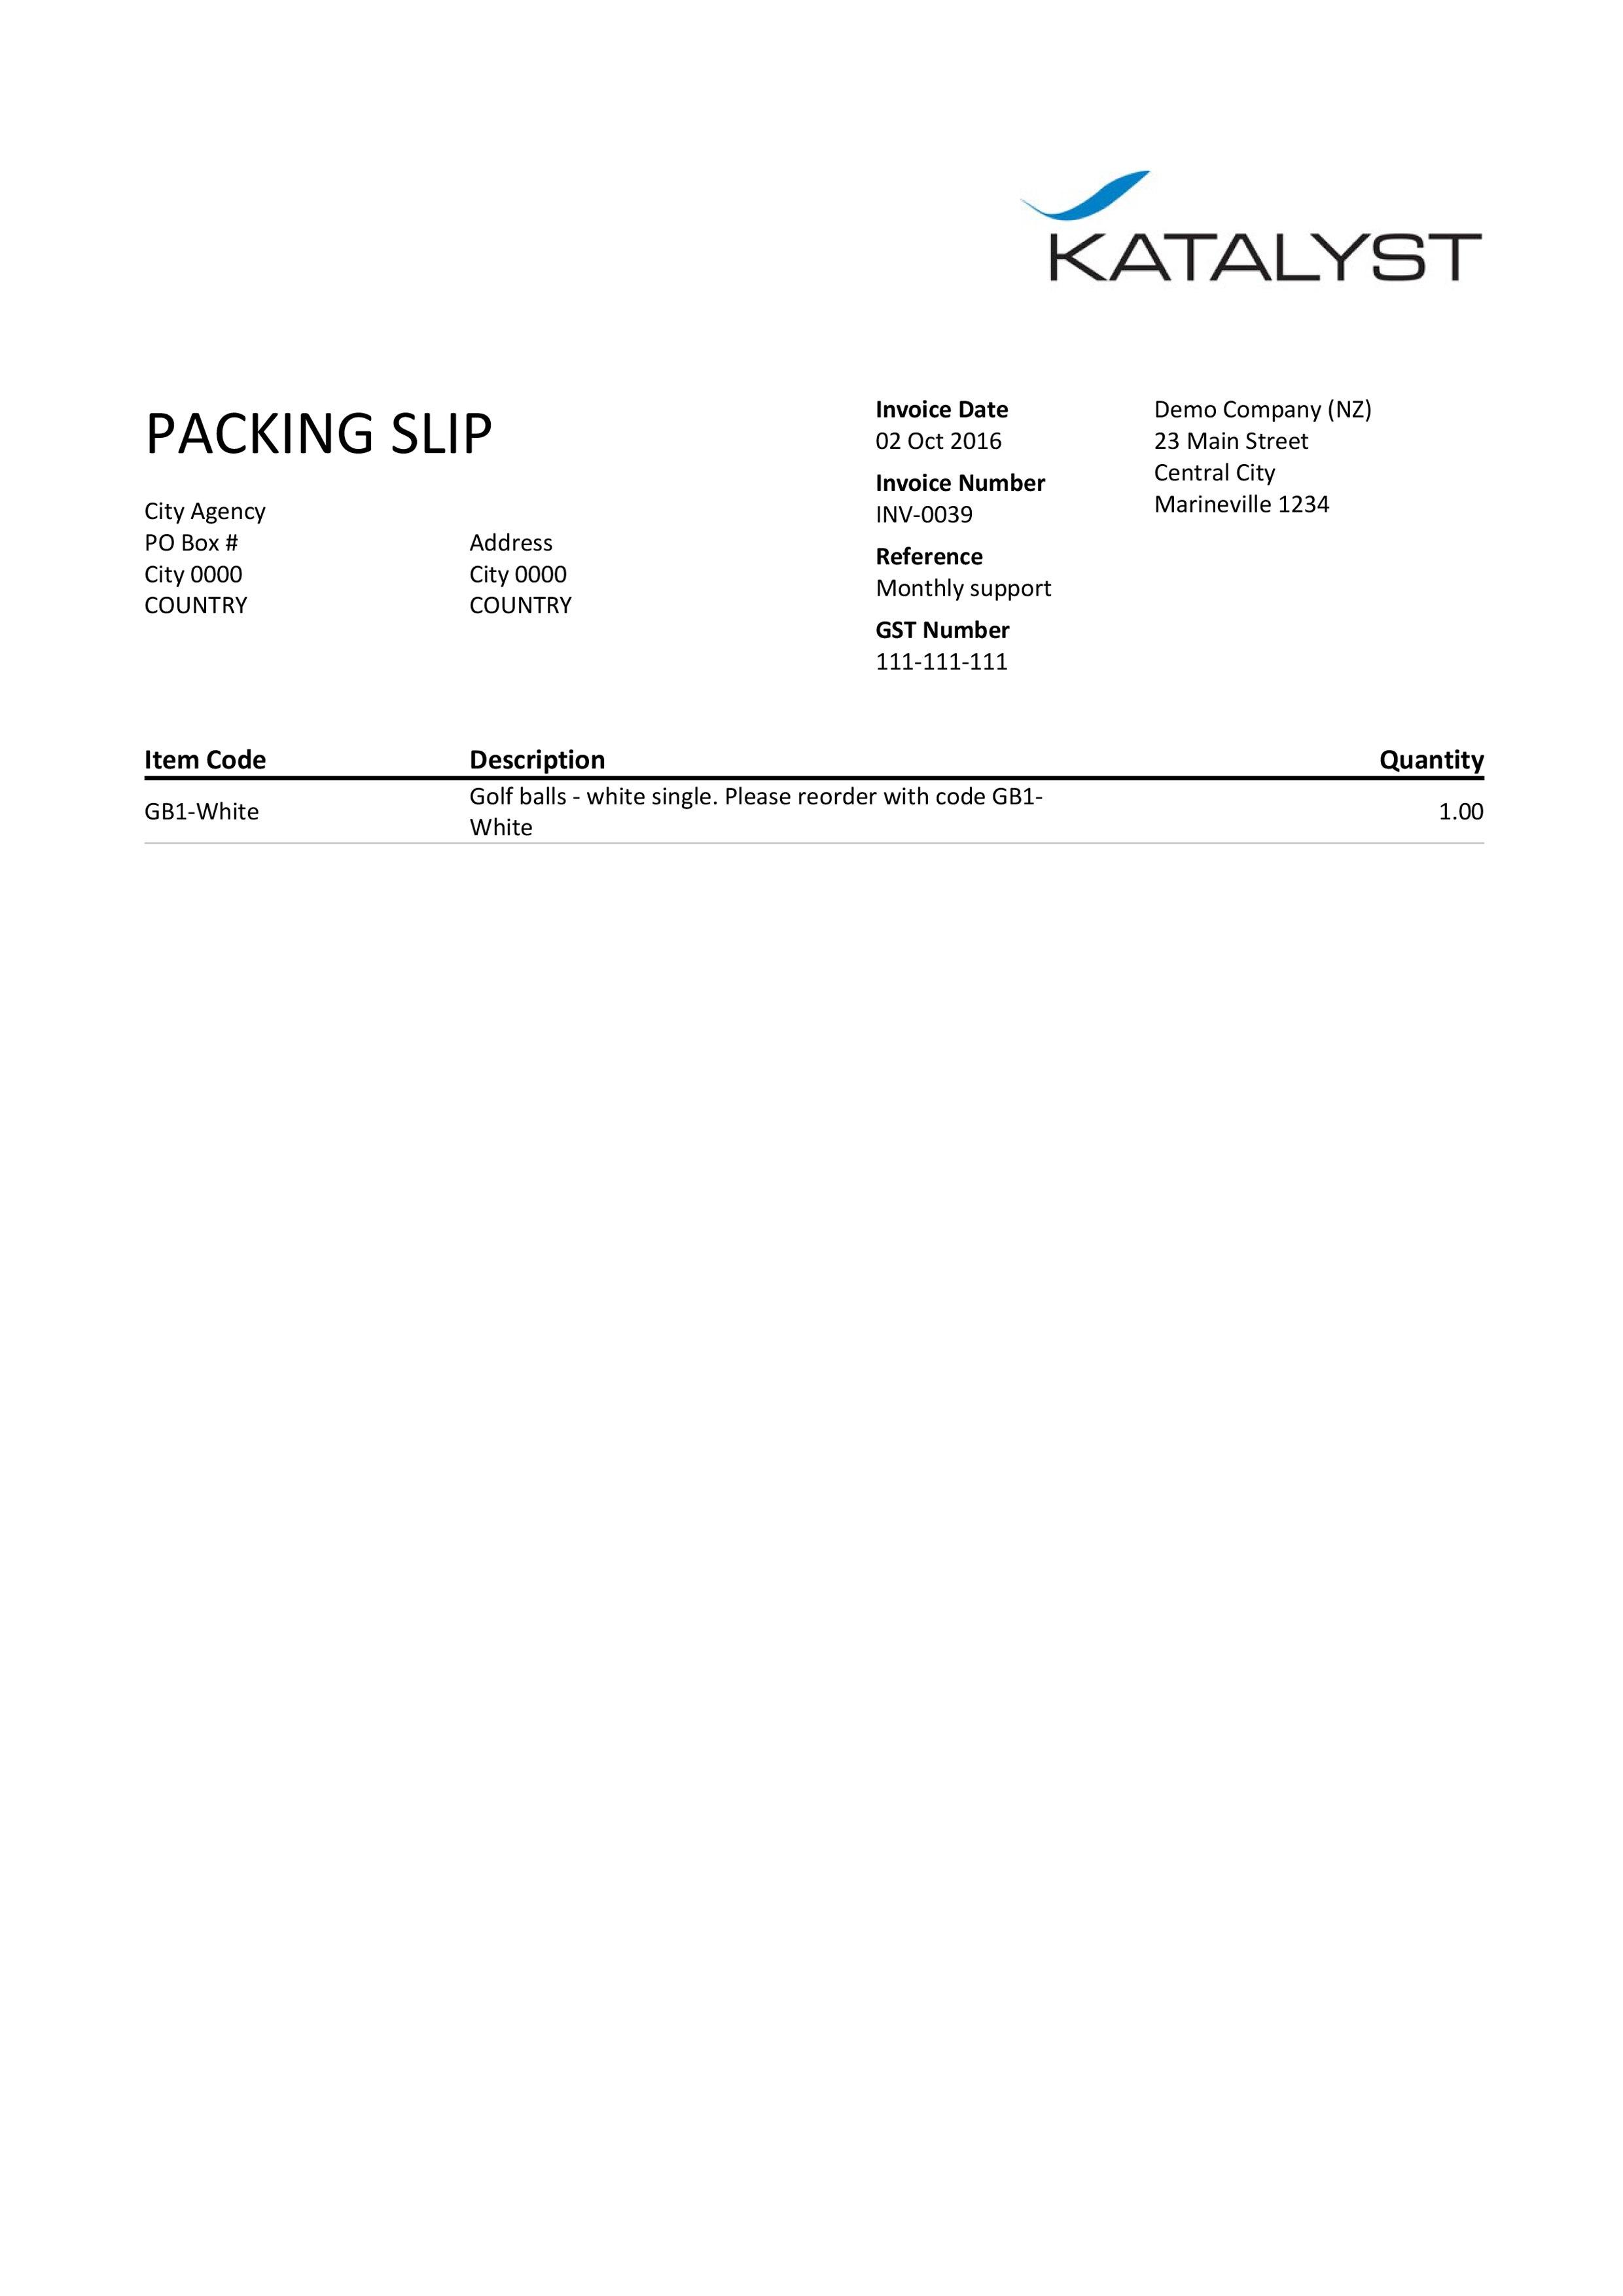 Xero Custom Template  Packing Slip  Katalyst Office  Bookkeeper Inside Xero Custom Invoice Template